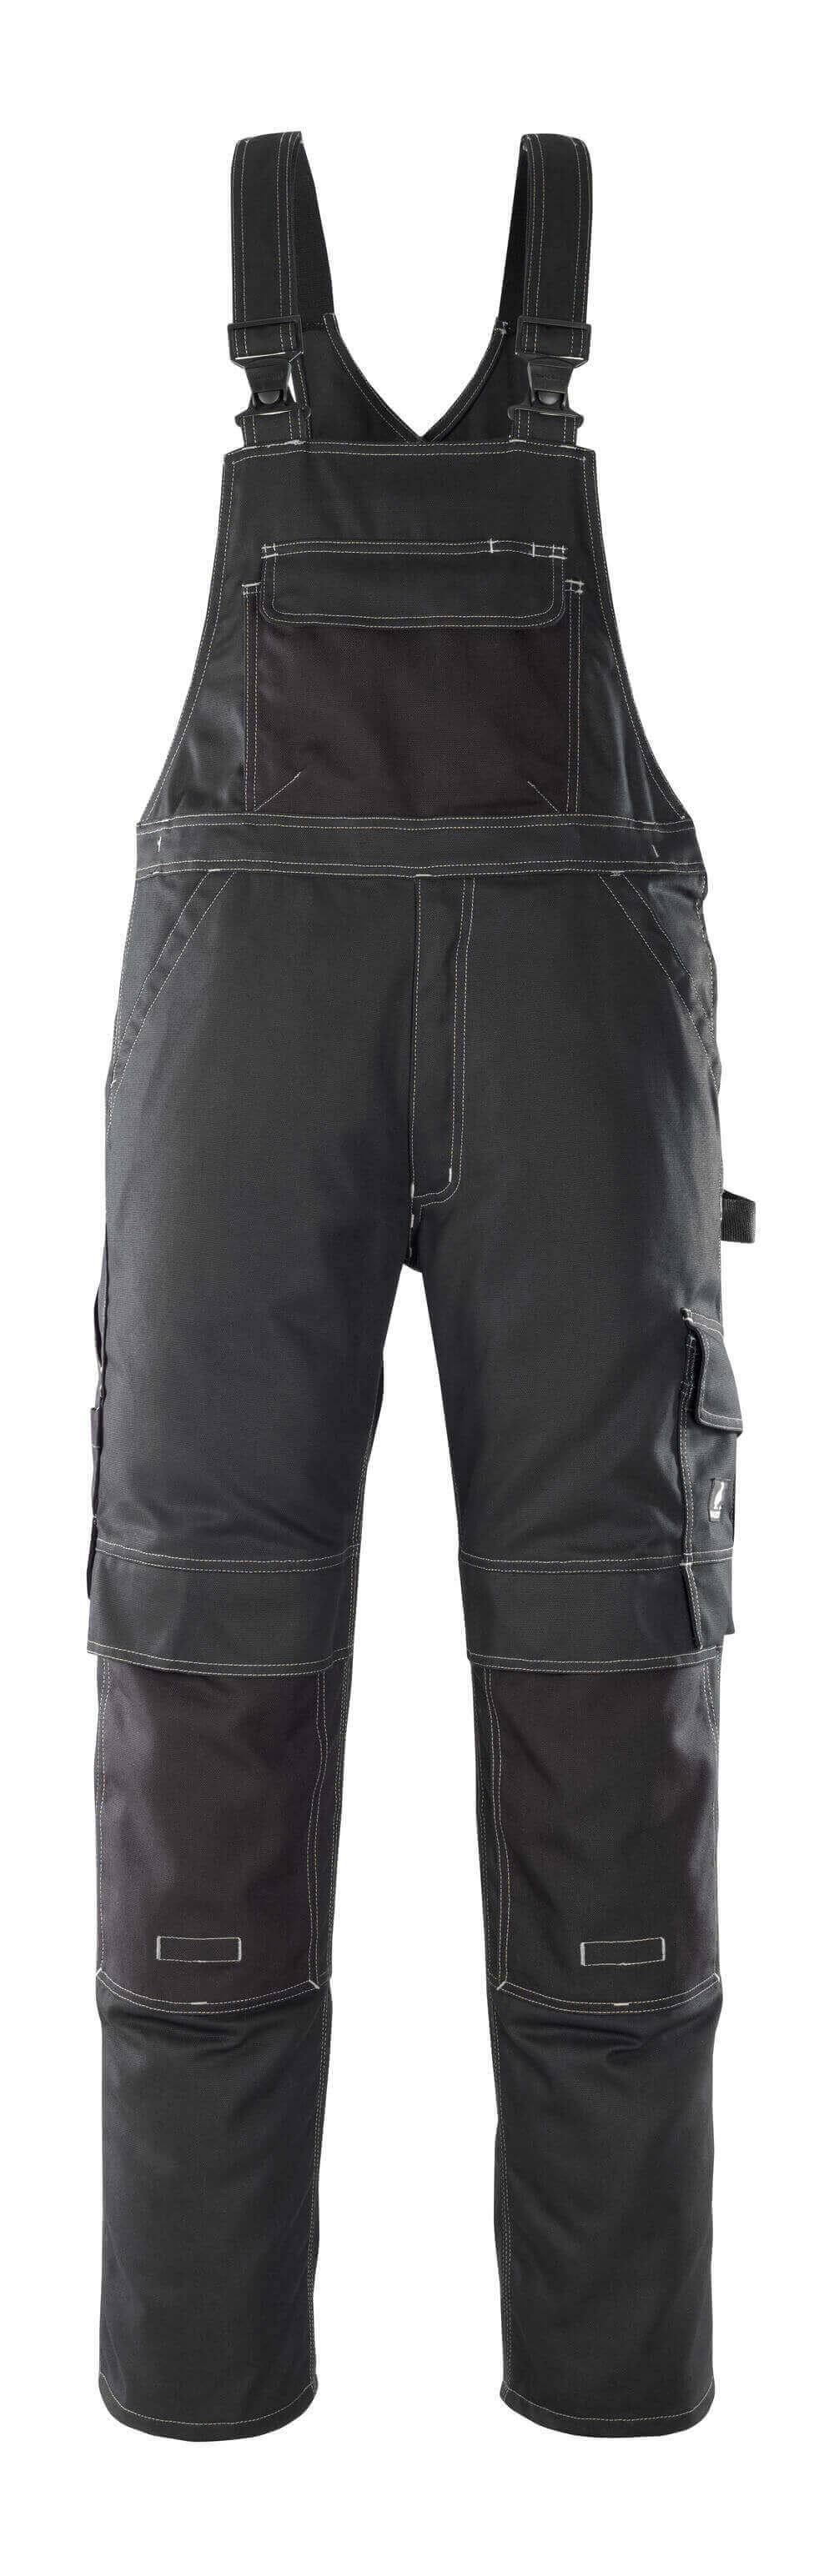 08269-010-09 Bib & Brace with kneepad pockets - black